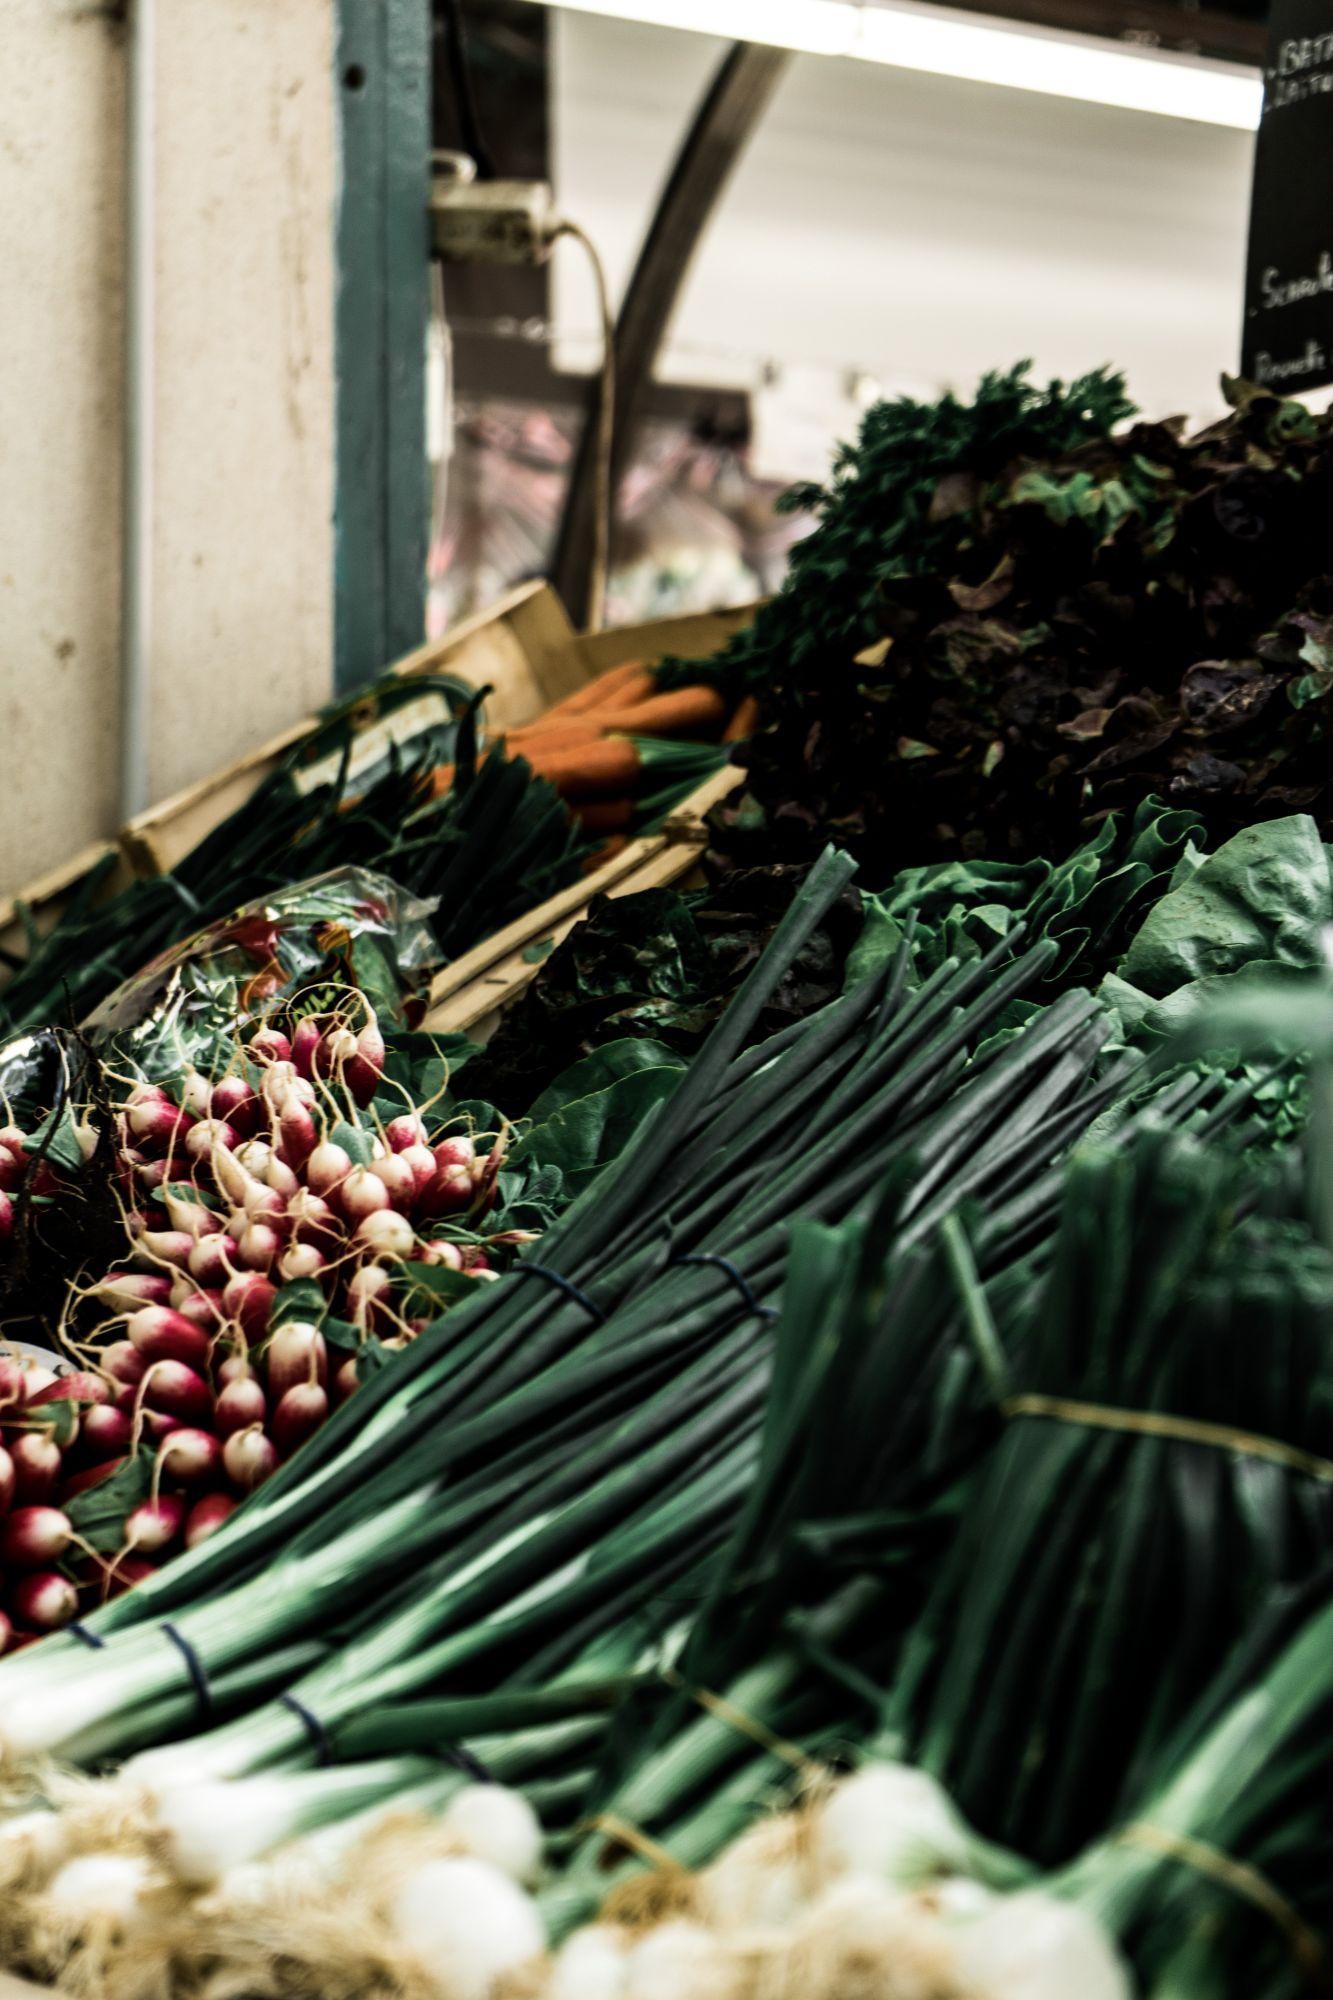 Vegetables from a fresh market (Photo by Artiom Vallat on Unsplash)